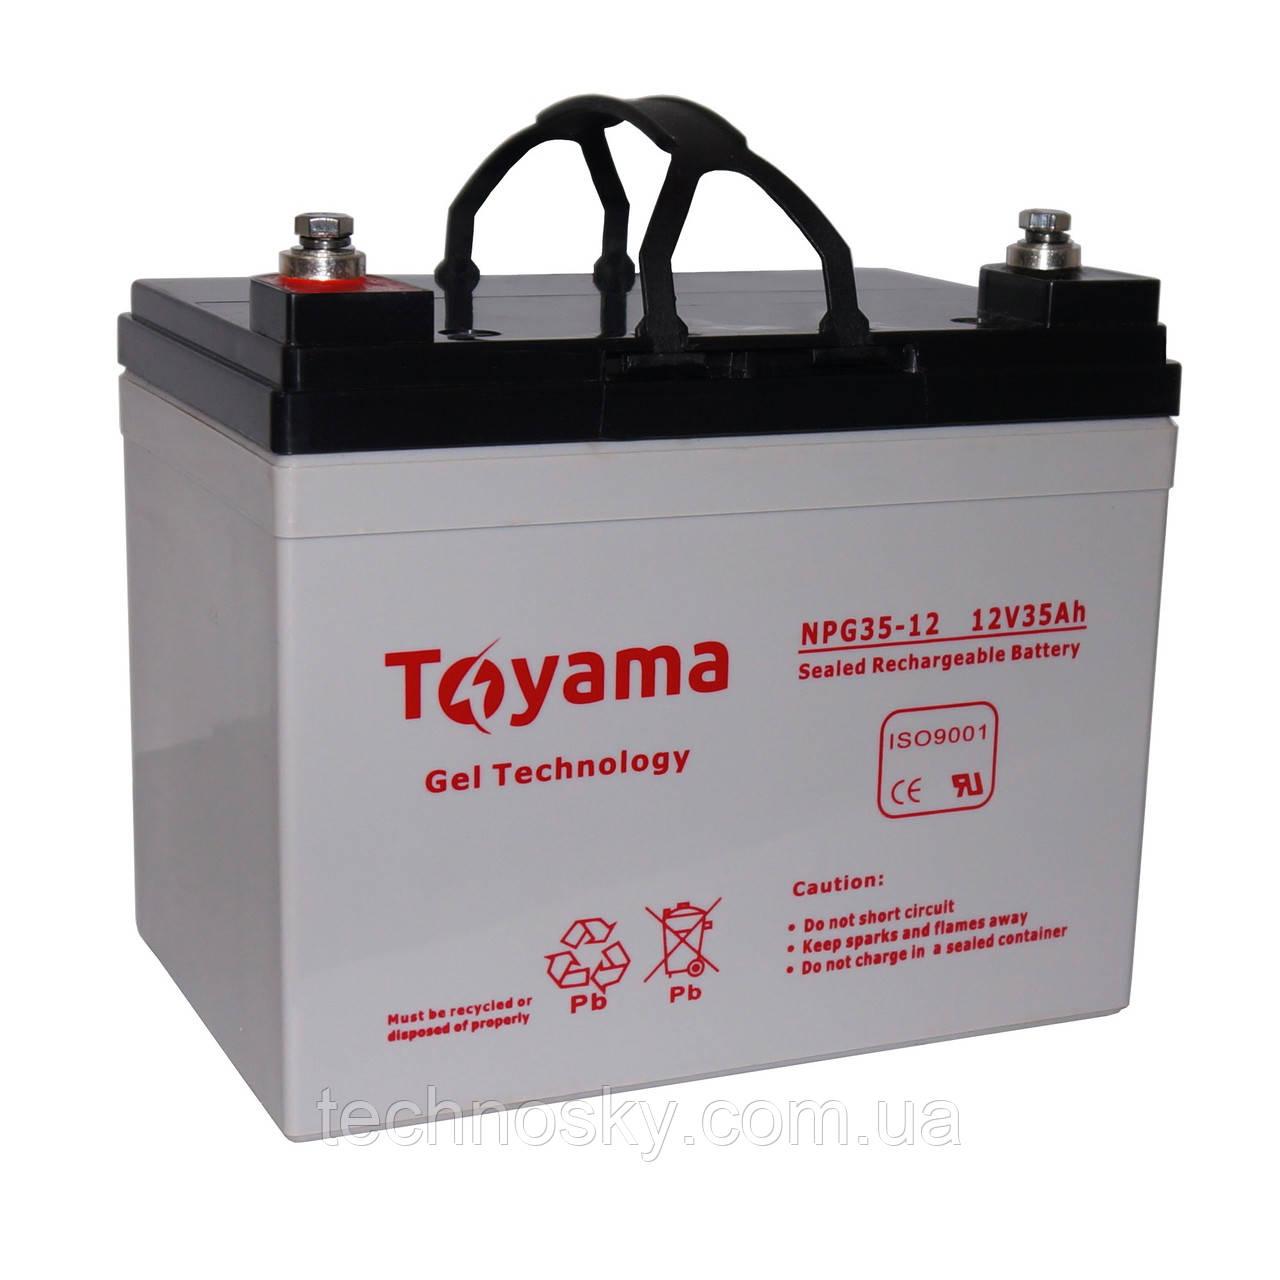 Гелевая батарея Toyama NPG 35-12 (12В , 35Ач)